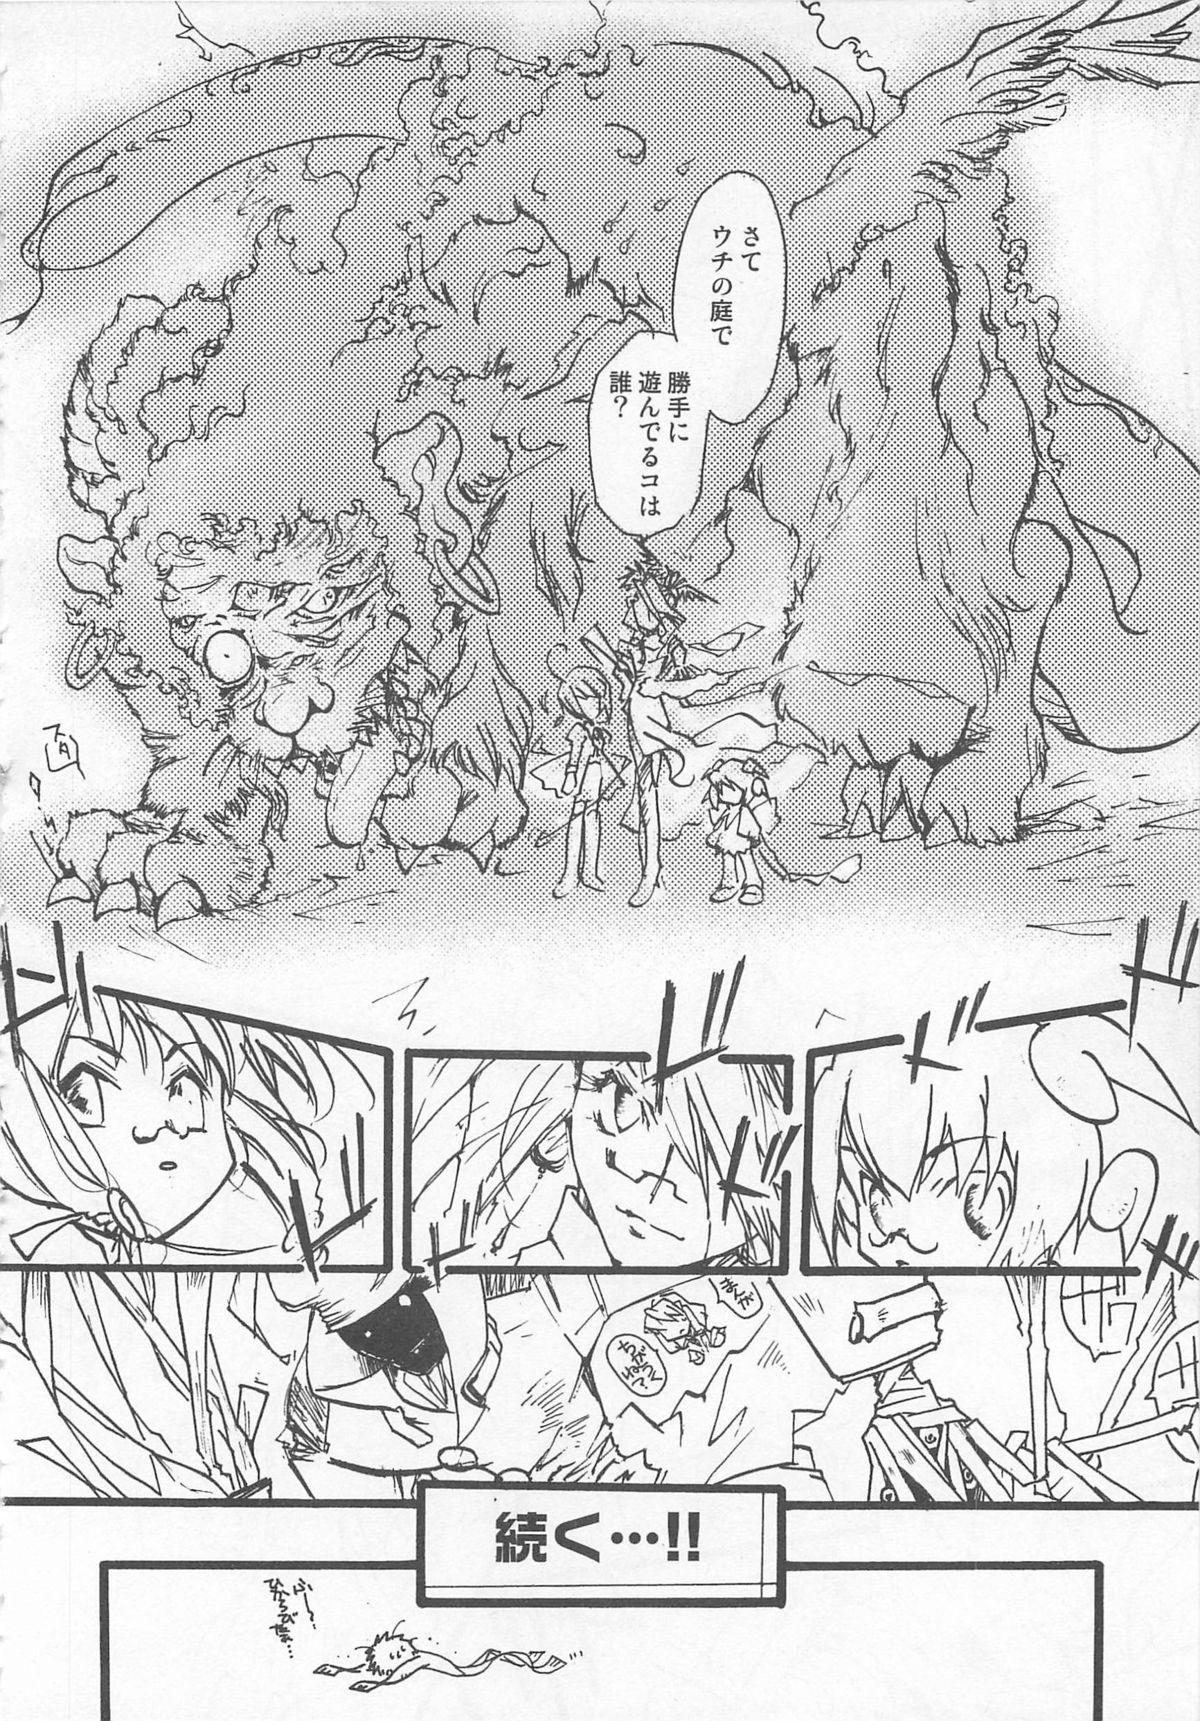 Otokonoko HEAVEN Vol. 02 Dokidoki Chikan Taiken 20